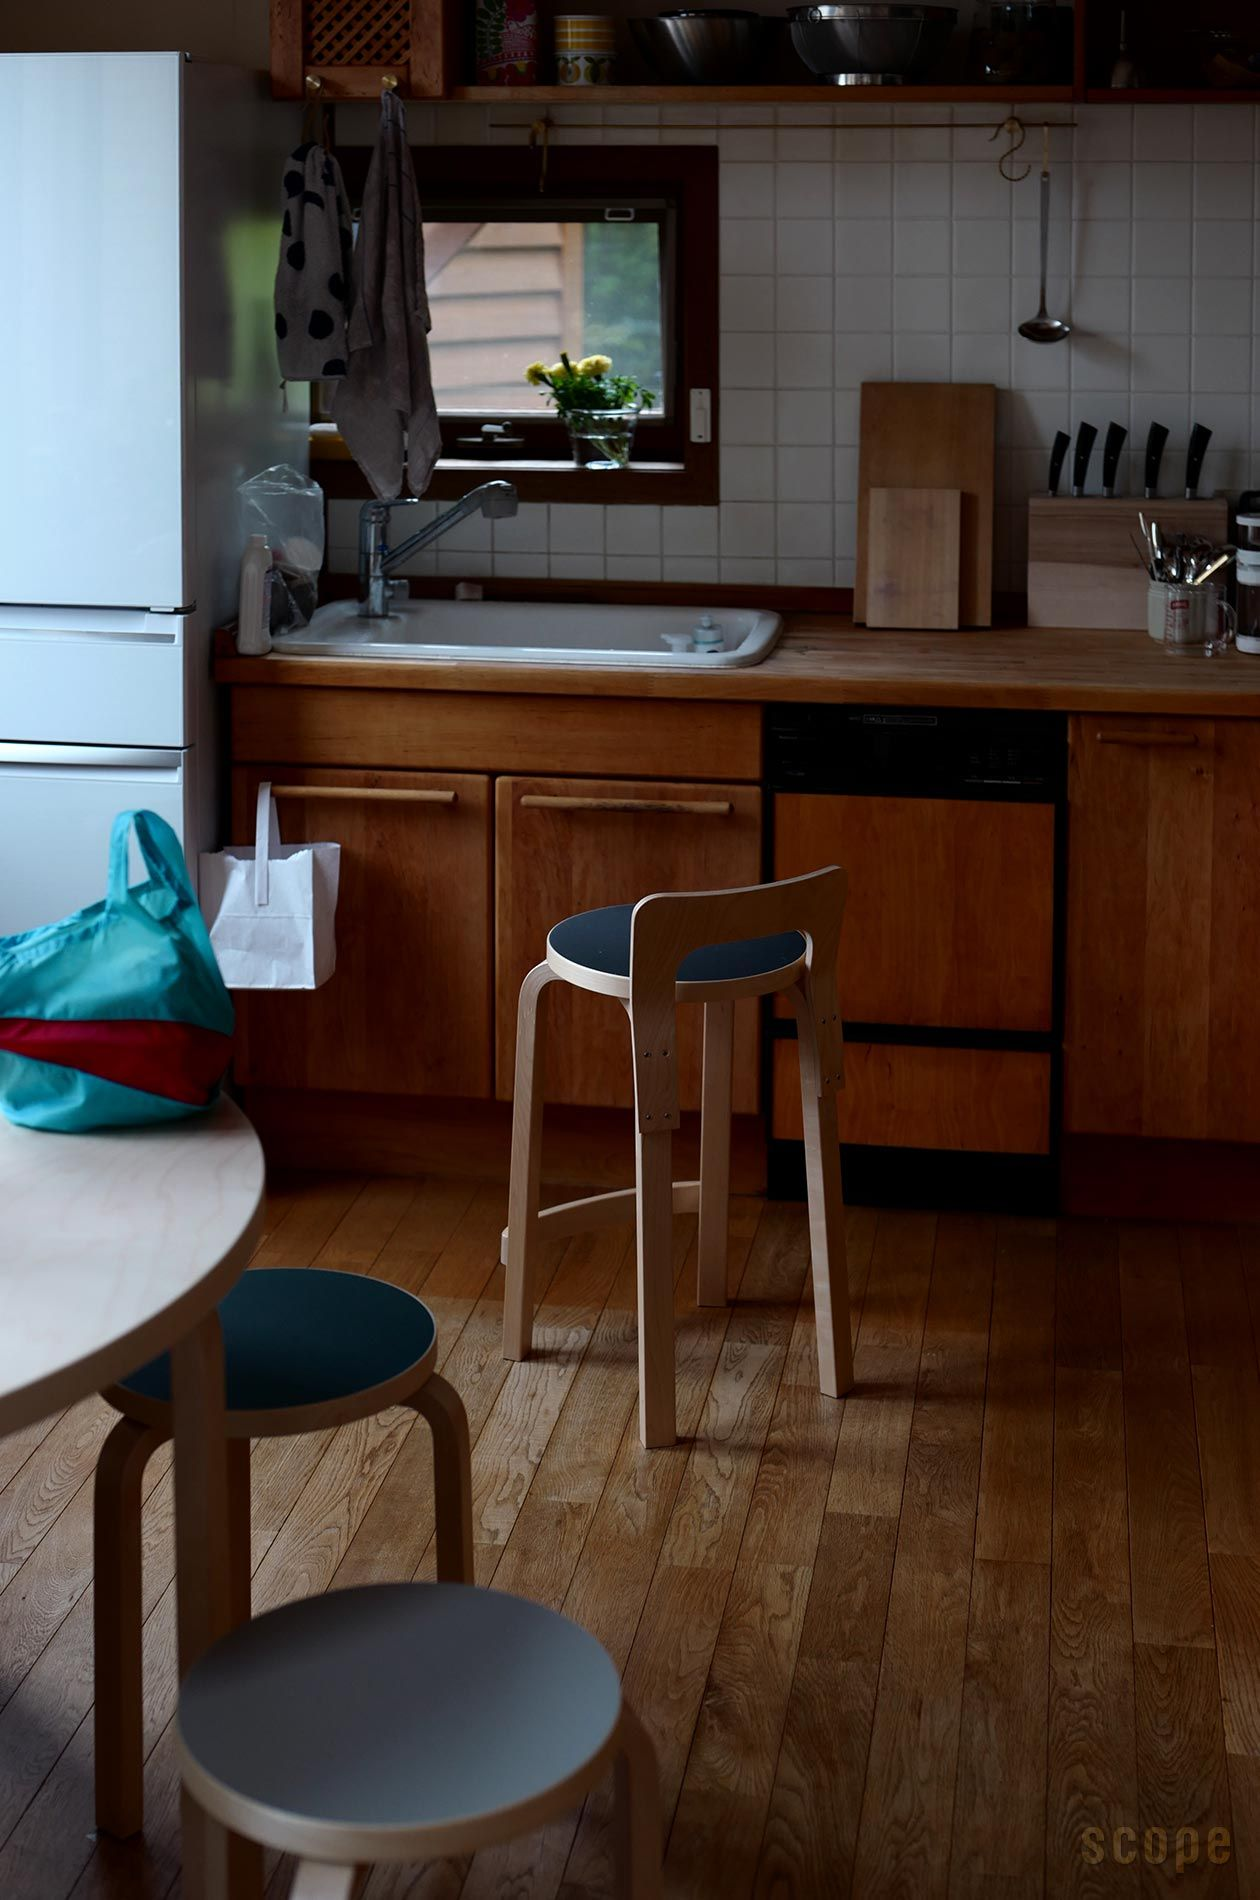 K65 High Chair Artek Scope キッチンダイニングルーム ハイチェア キッチン